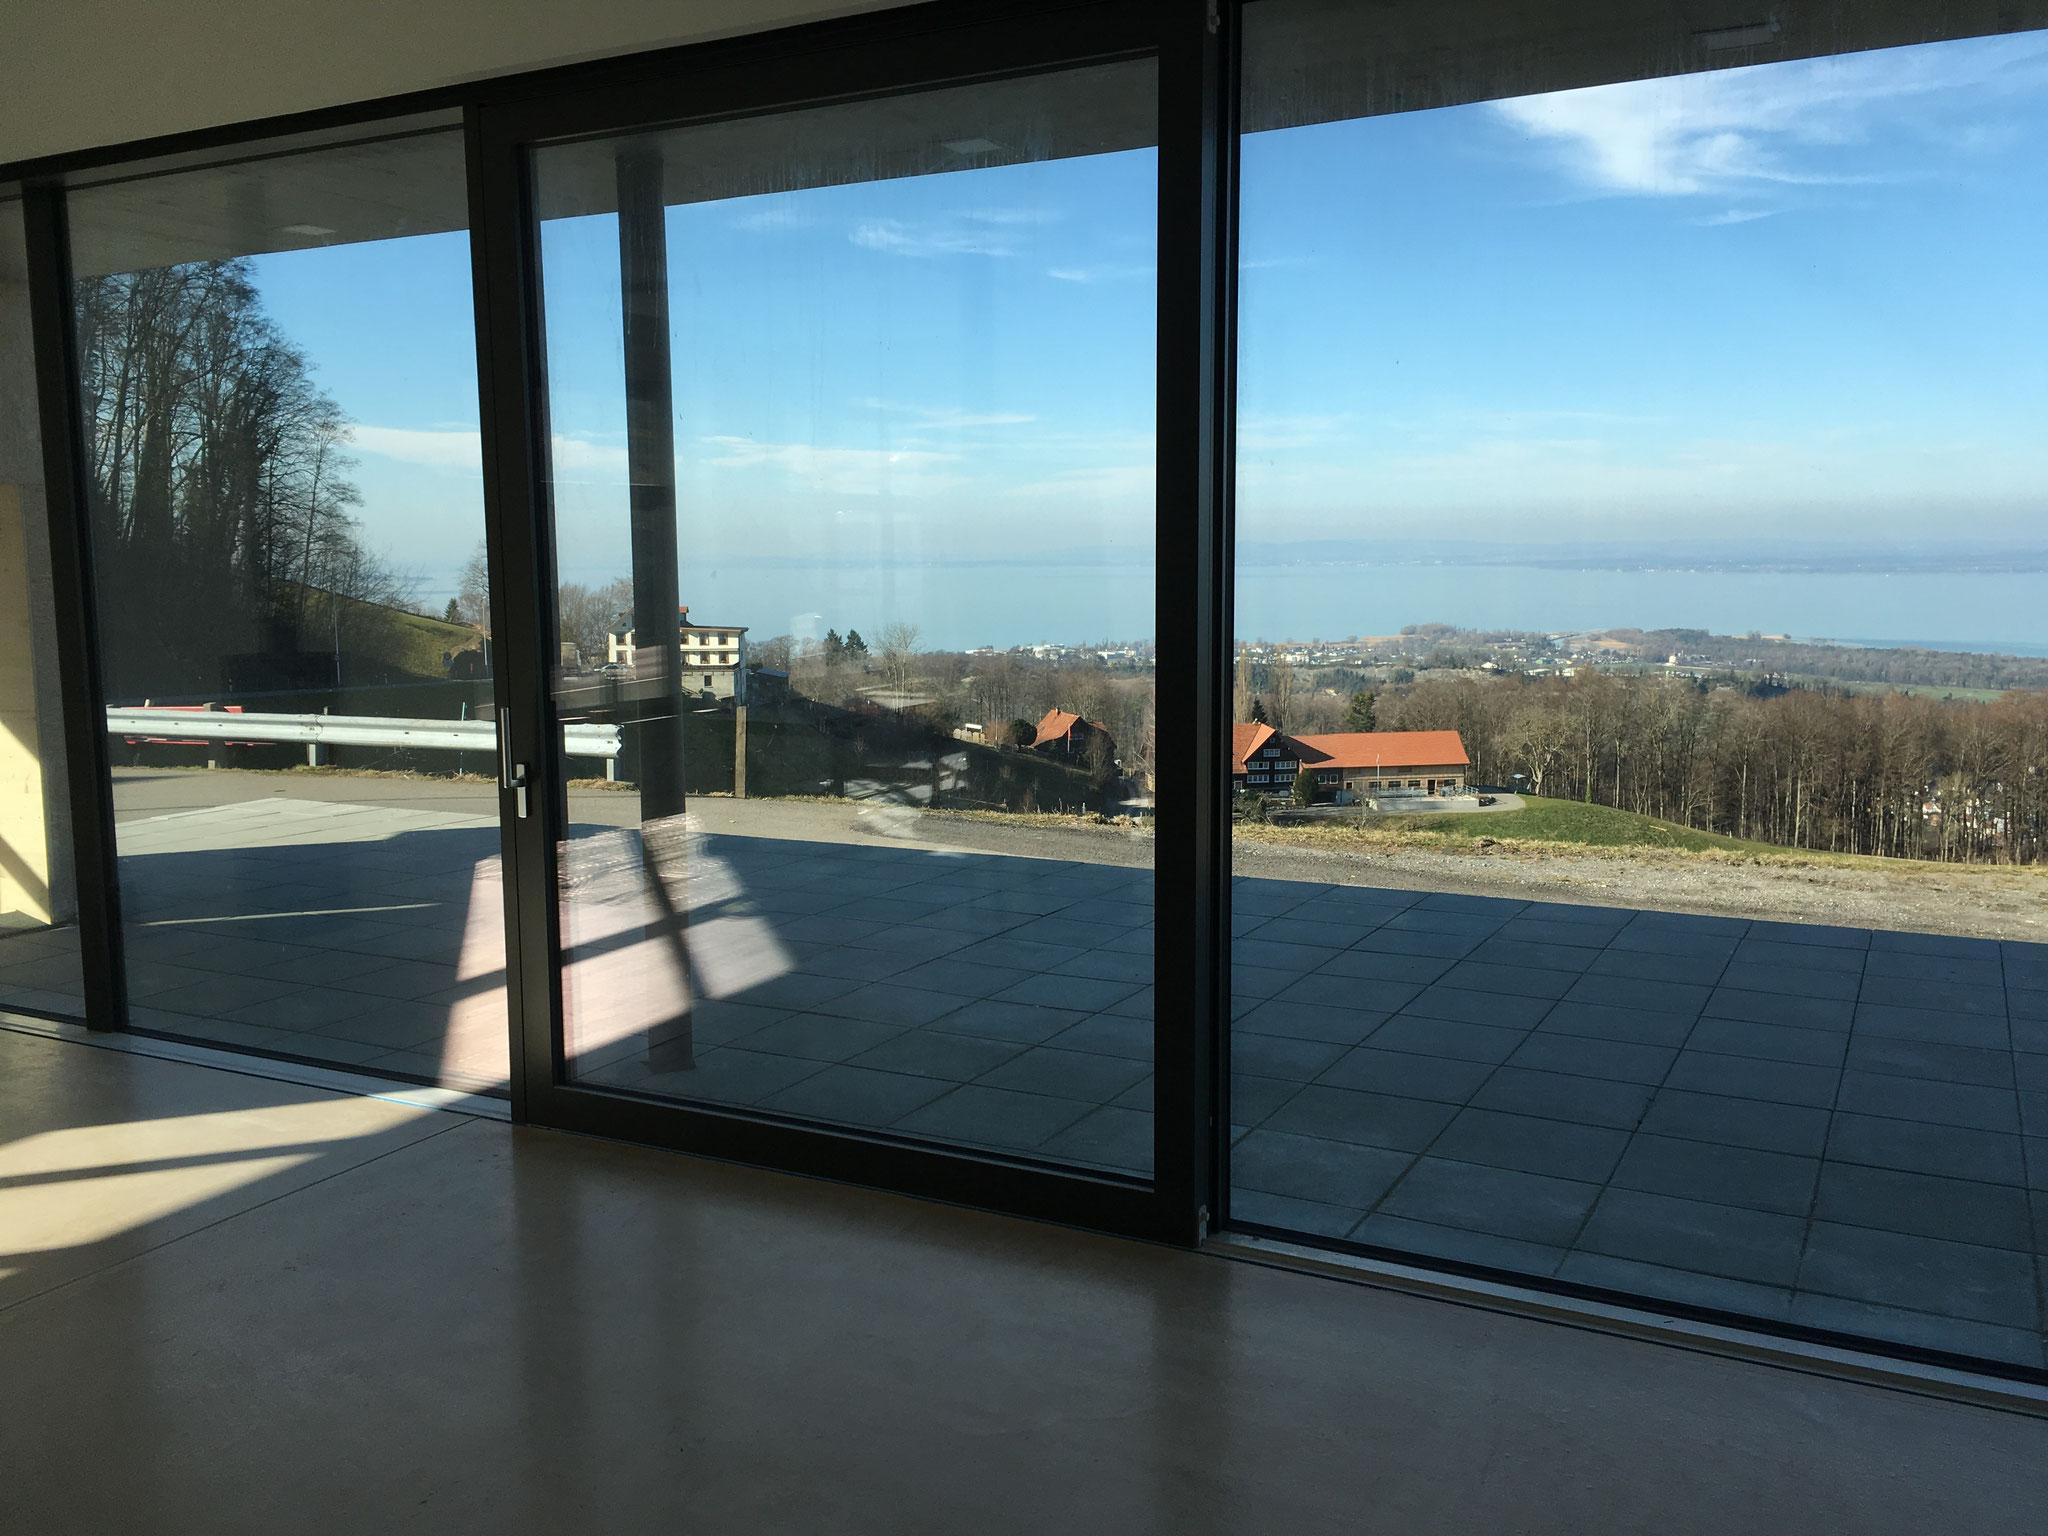 Umbau Fabrik in MFH: Fabrikfront neu